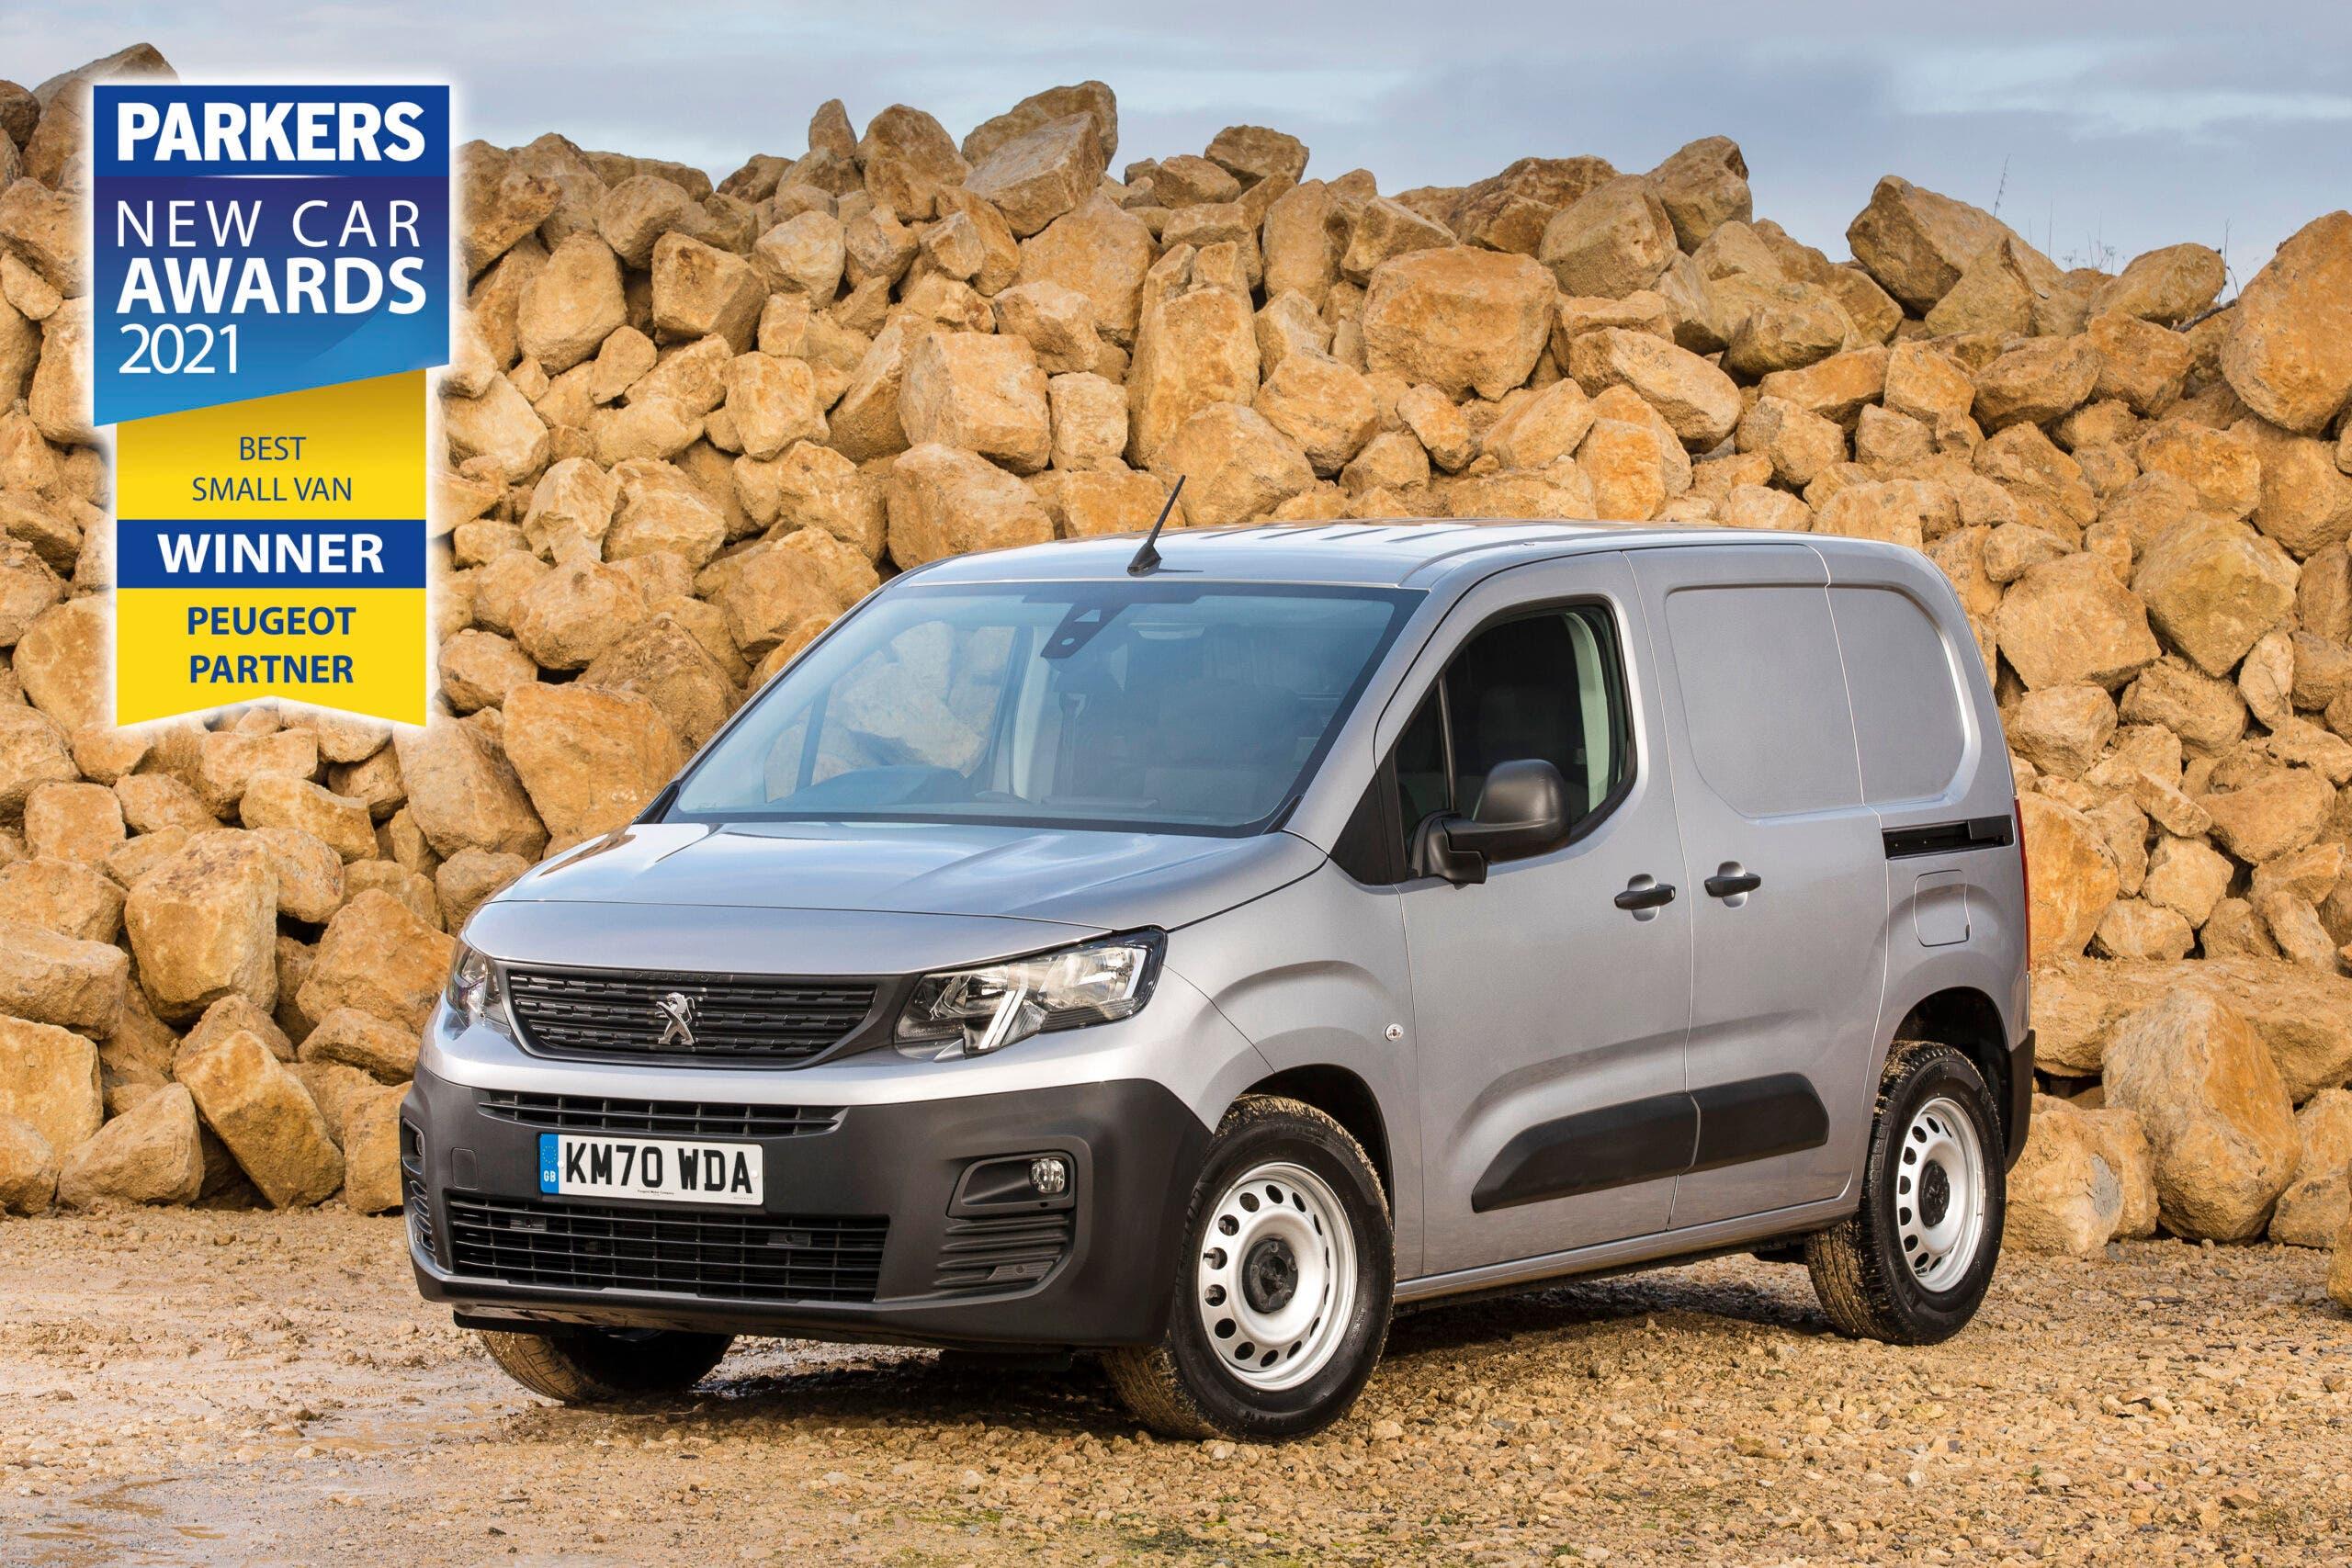 Peugeot Partner Parkers New Car Awards 2021